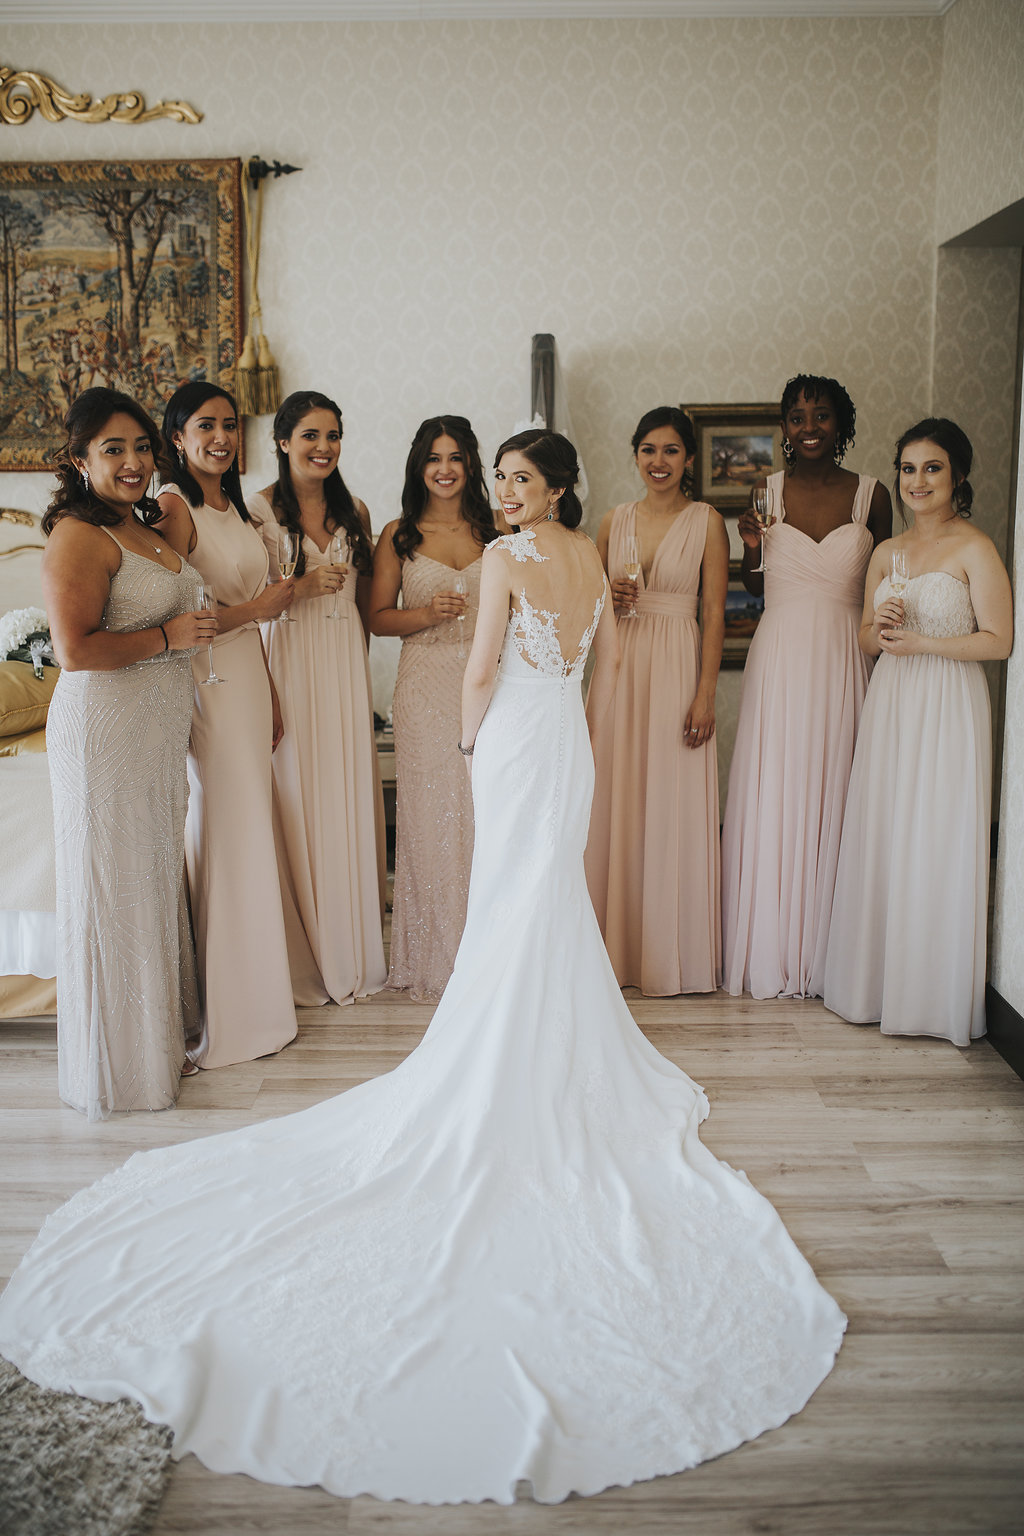 julieth-bravo-wedding-planner-bogota-villadeleyva-hotel-casa-rea-damas-de-honor-wedding-planner-pronovias-blush-destino-boda.jpg